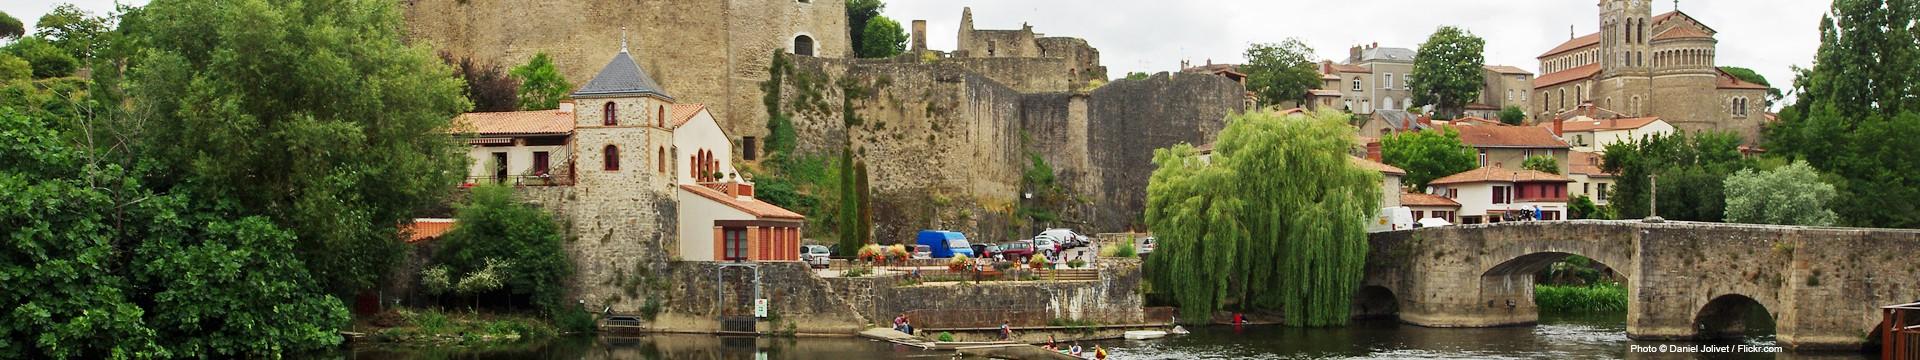 Nantes Sud 3 : Clisson -